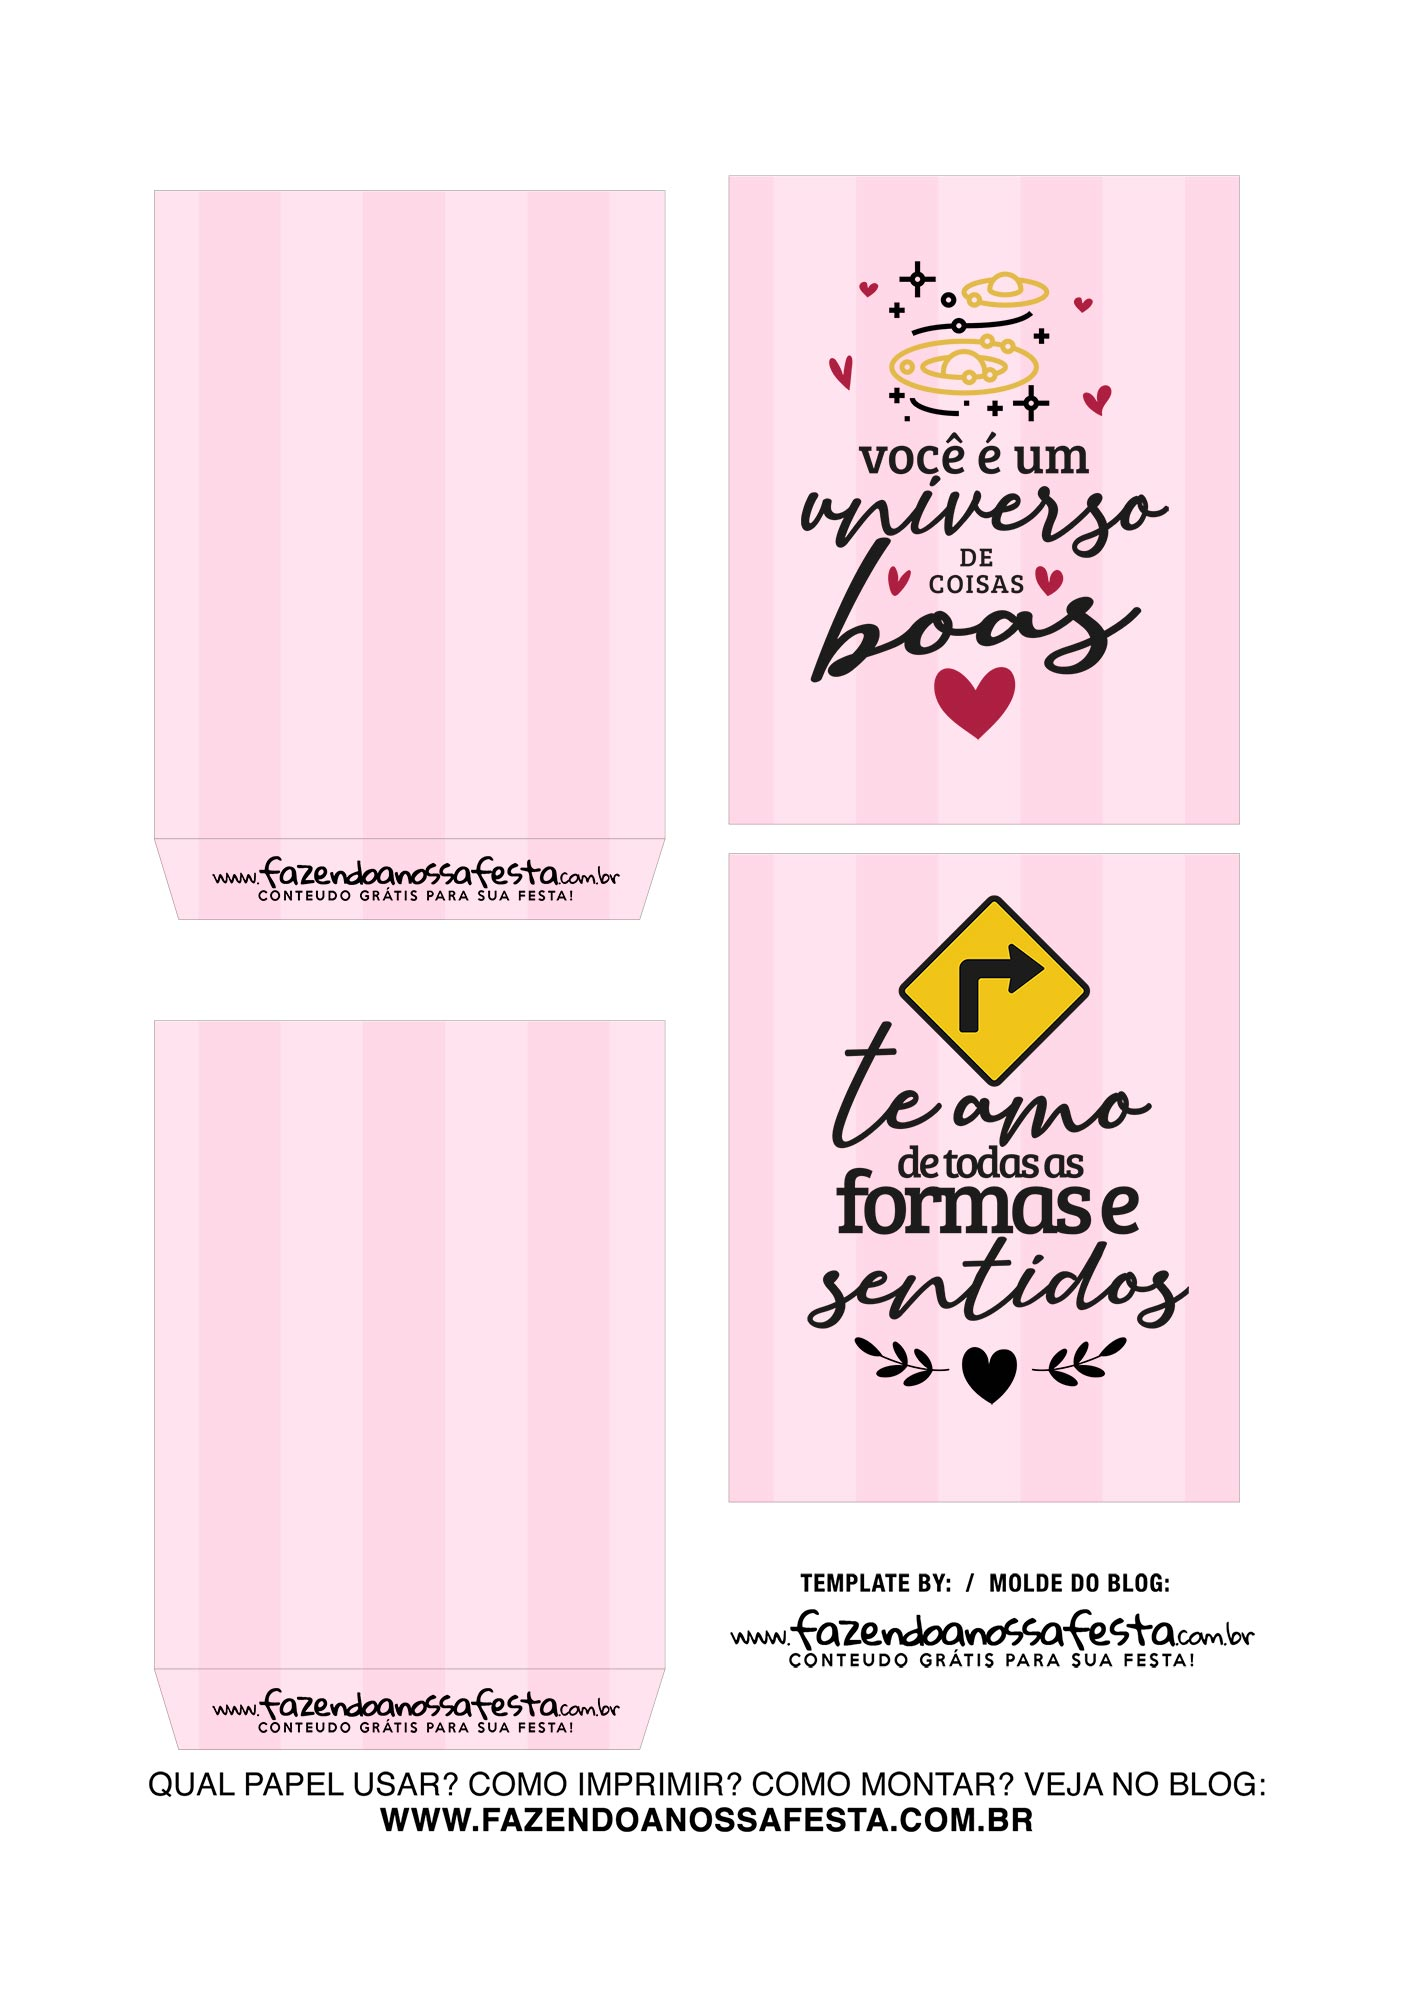 Caixa Explosiva Dia dos Namorados Rosa Coracoes 3